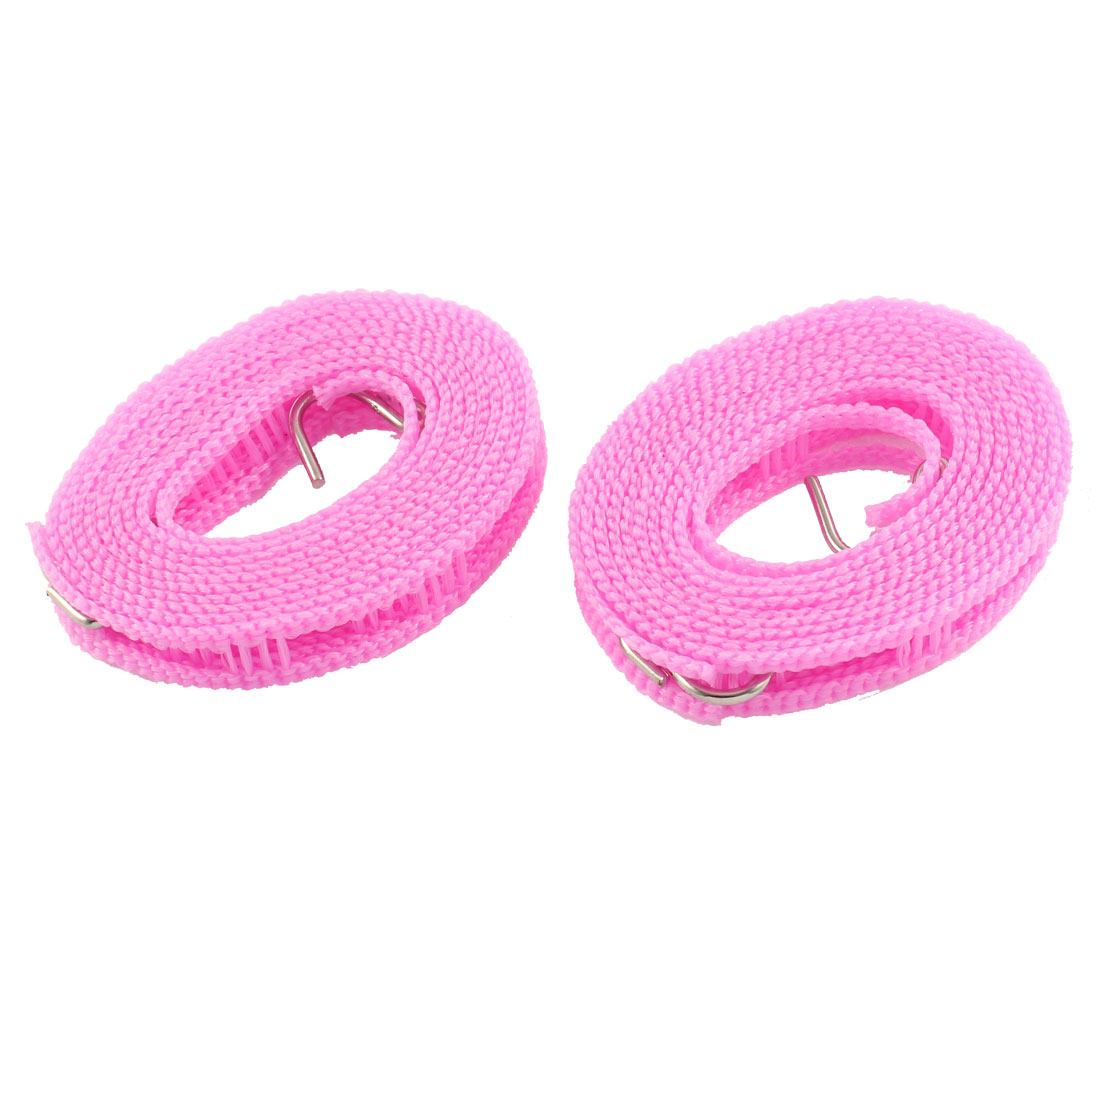 2 Pcs Metal Hooks Nonslip Windproof Folding Braided Clothesline Hanger Pink 2M